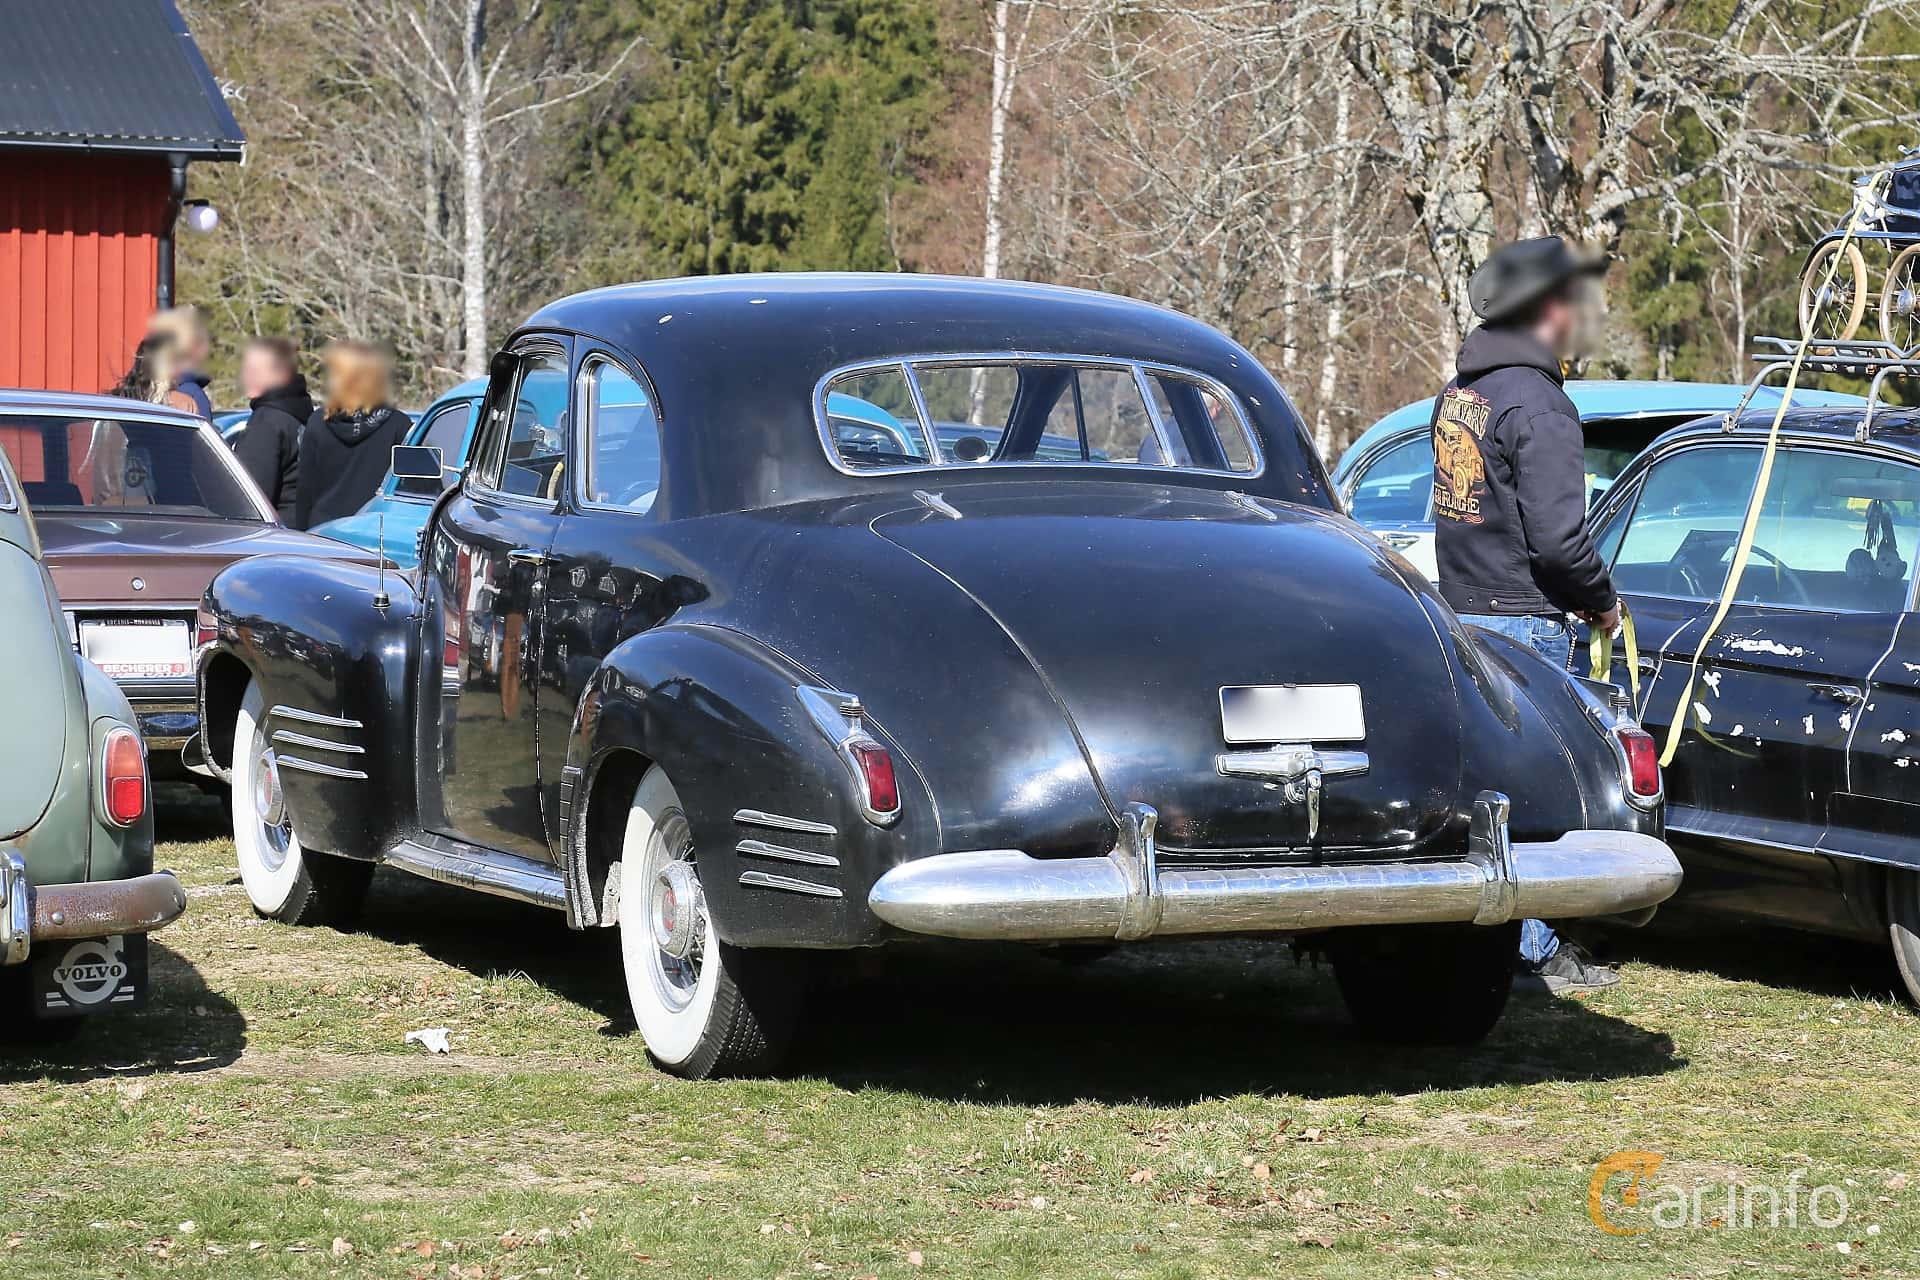 Back/Side of Cadillac Sixty-Two Coupé 5.7 V8 Hydra-Matic, 152ps, 1941 at Uddevalla Veteranbilsmarknad Backamo, Ljungsk 2019